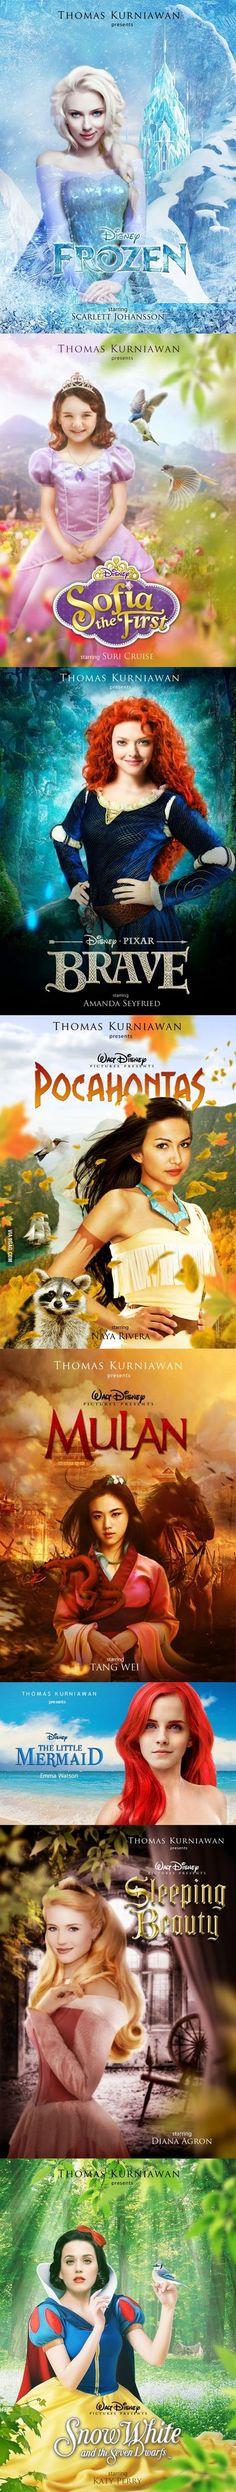 Modern movie posters: